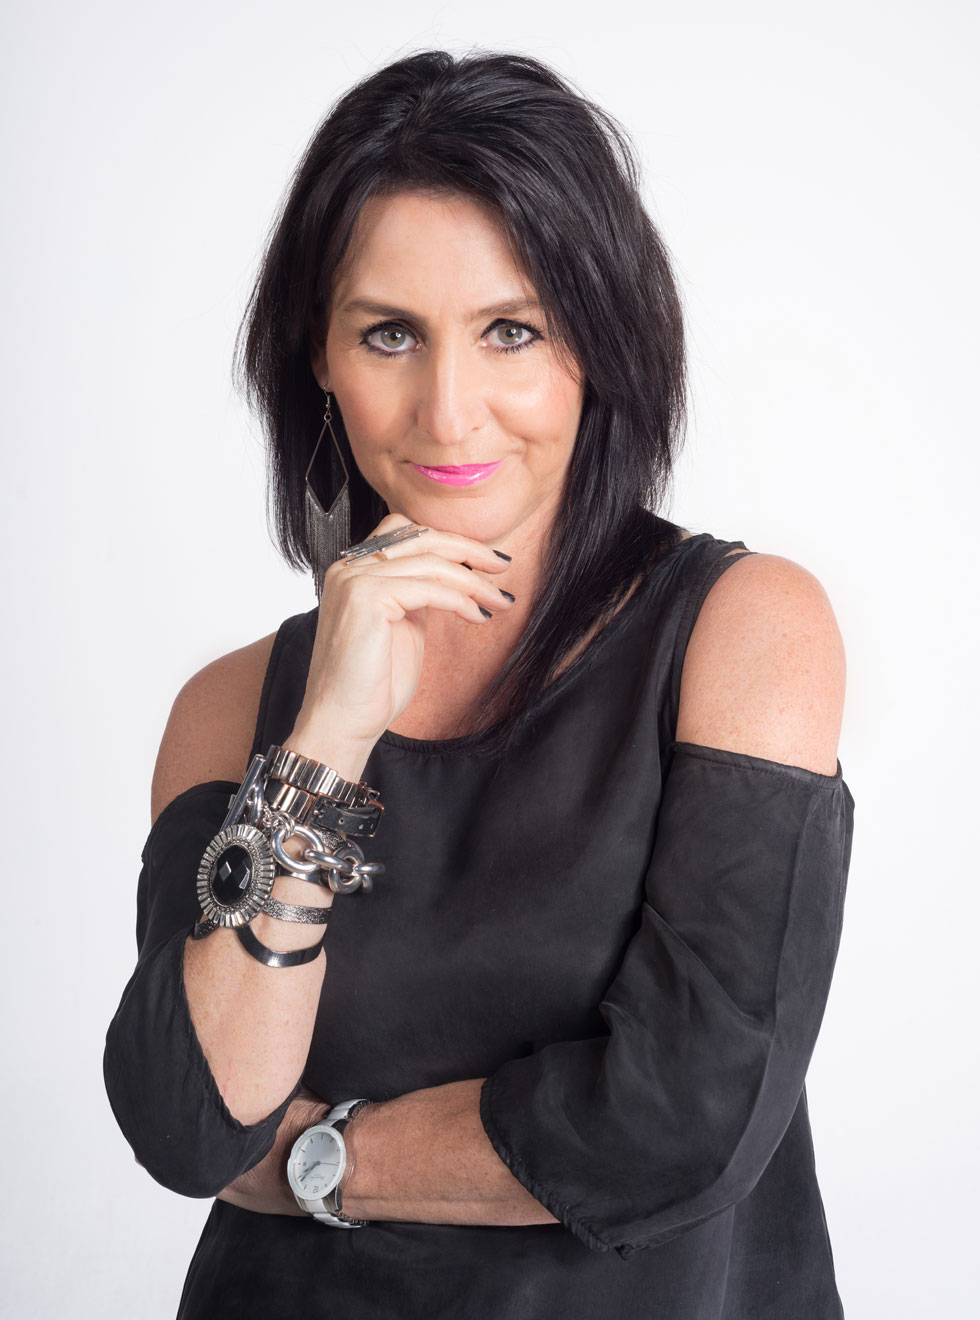 Speaker - Cindy Newstead